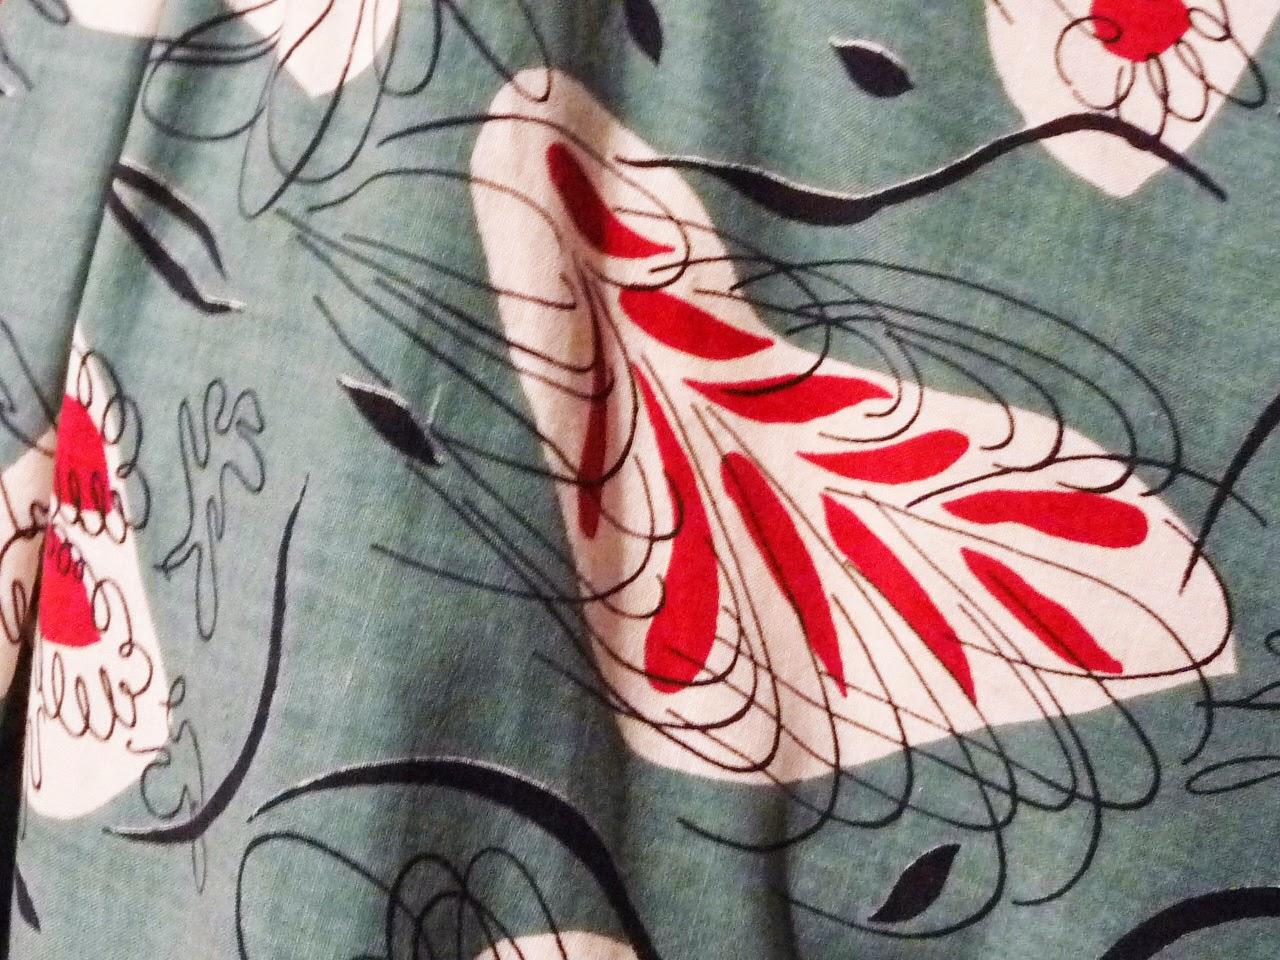 FTM London Artist textiles